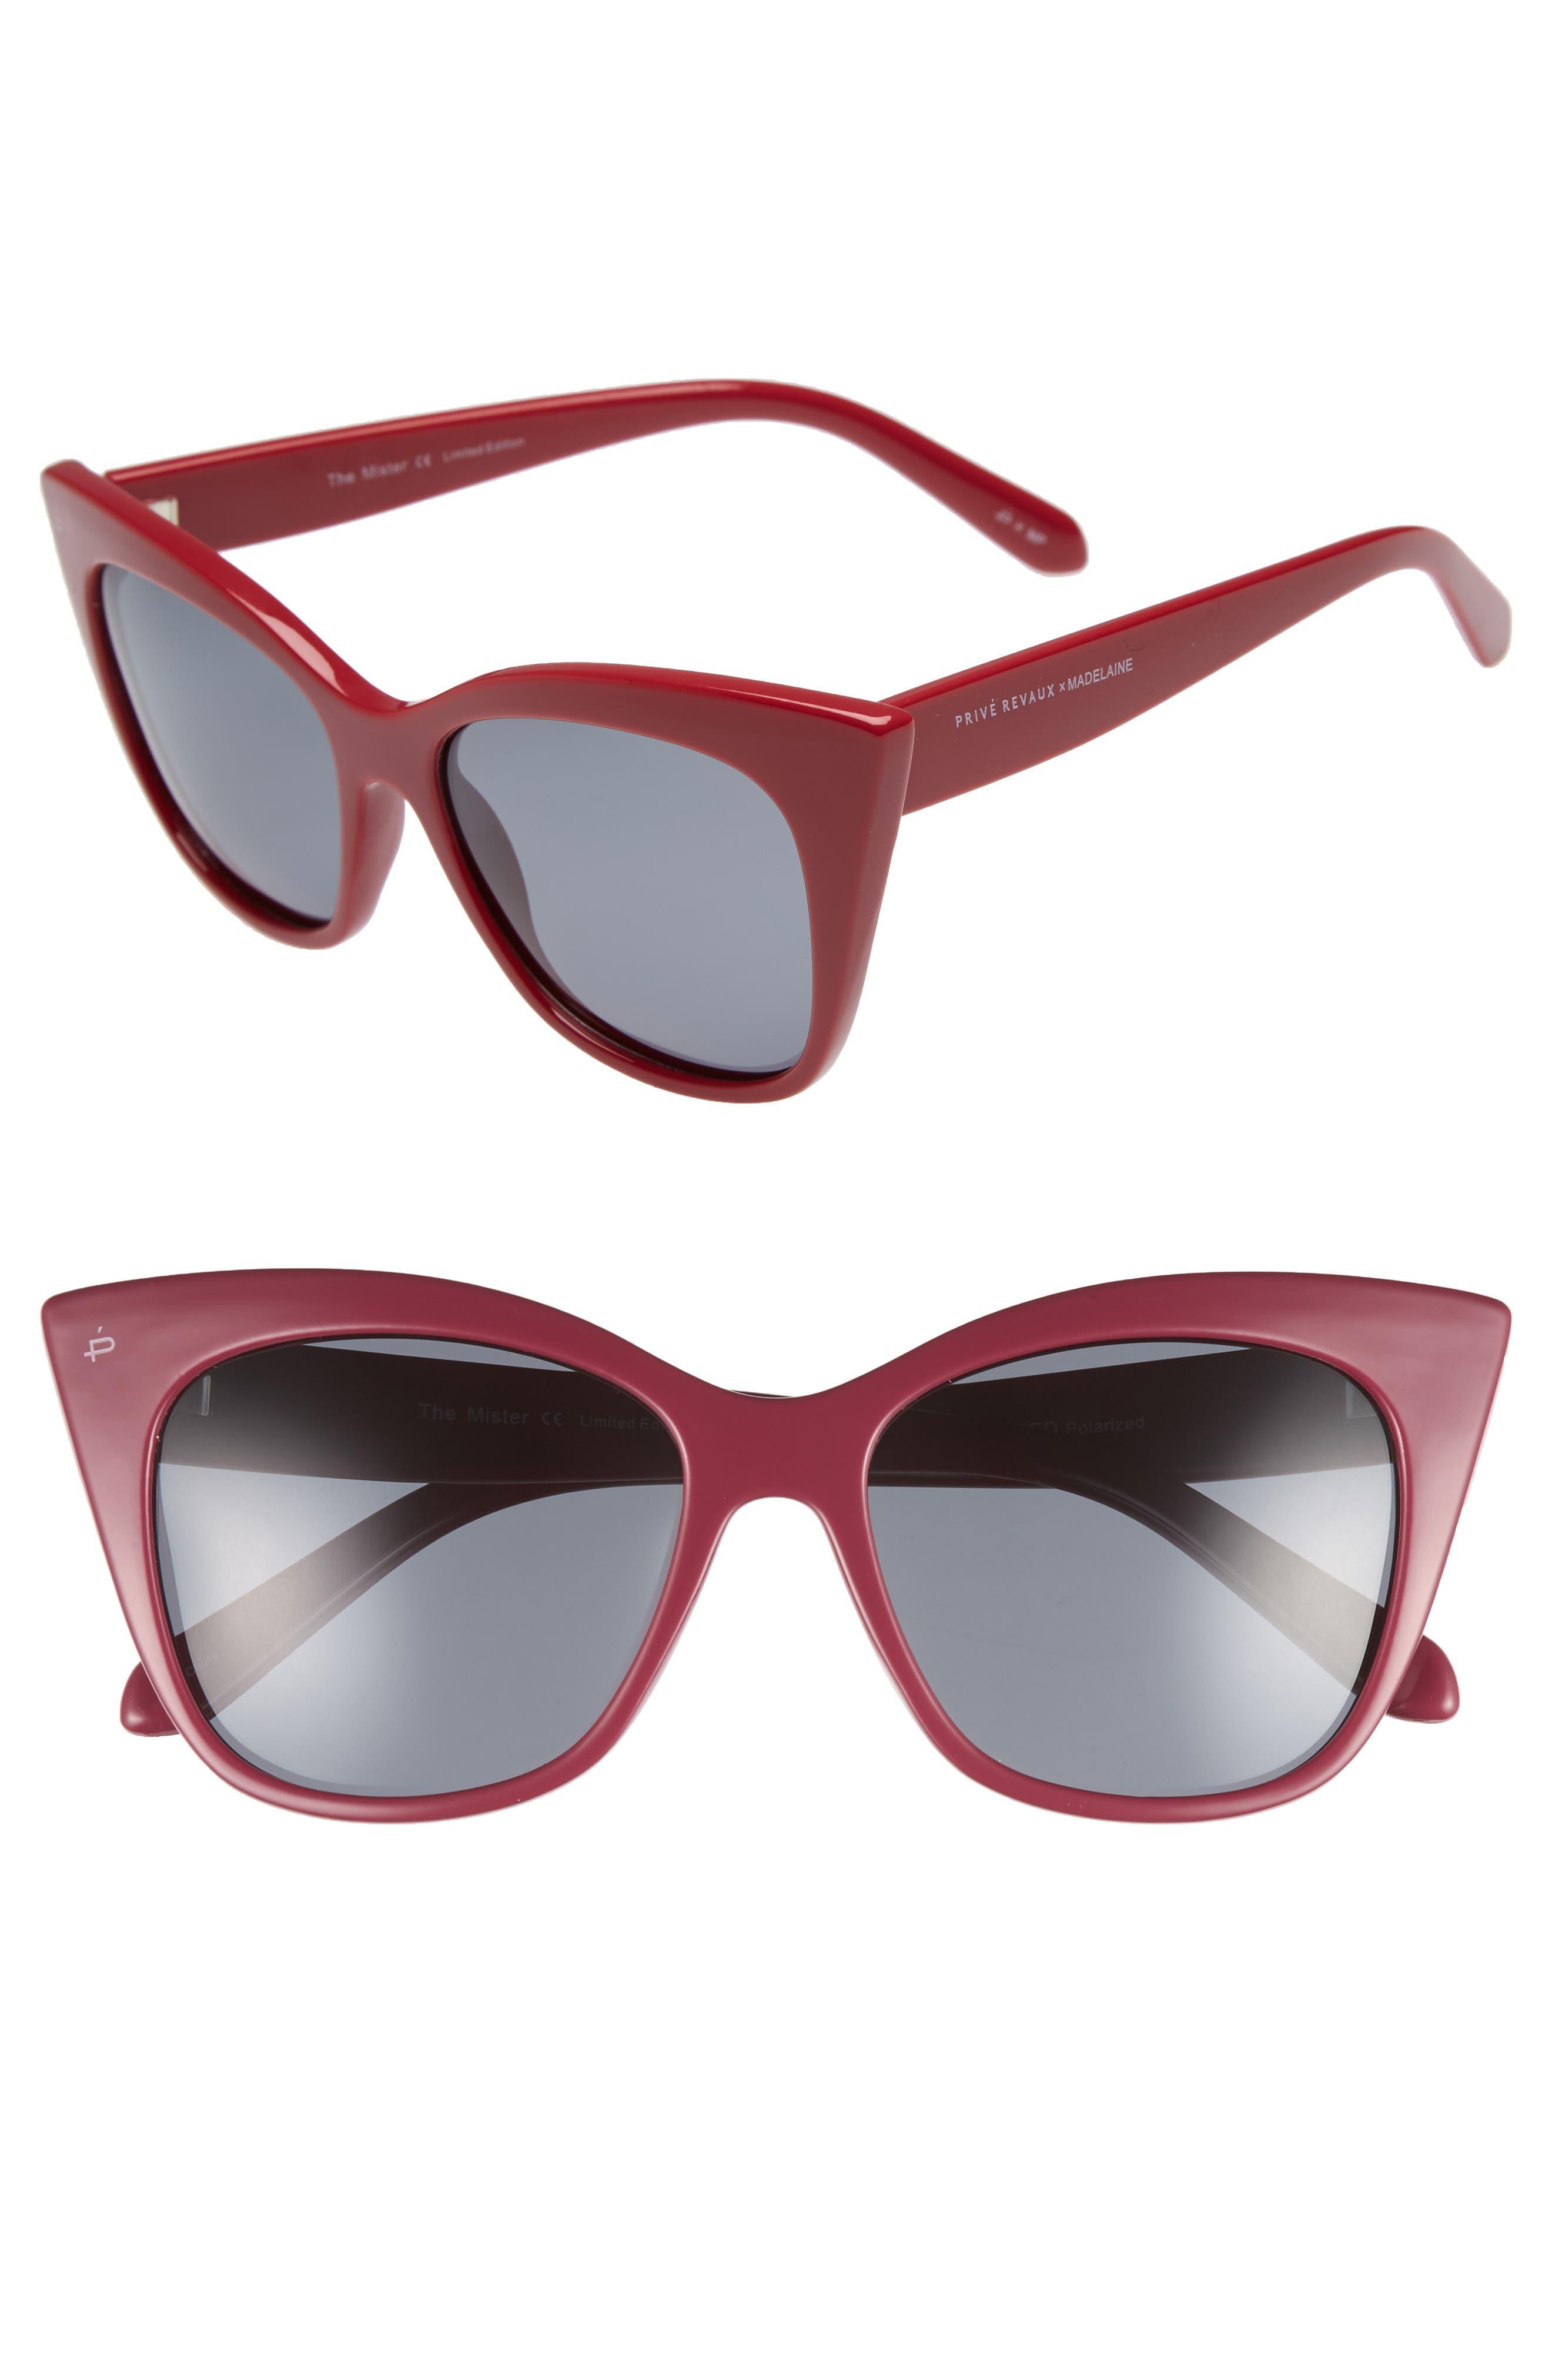 Privé Revaux x Madelaine Petsch The Mister 54mm Cat Eye Sunglasses